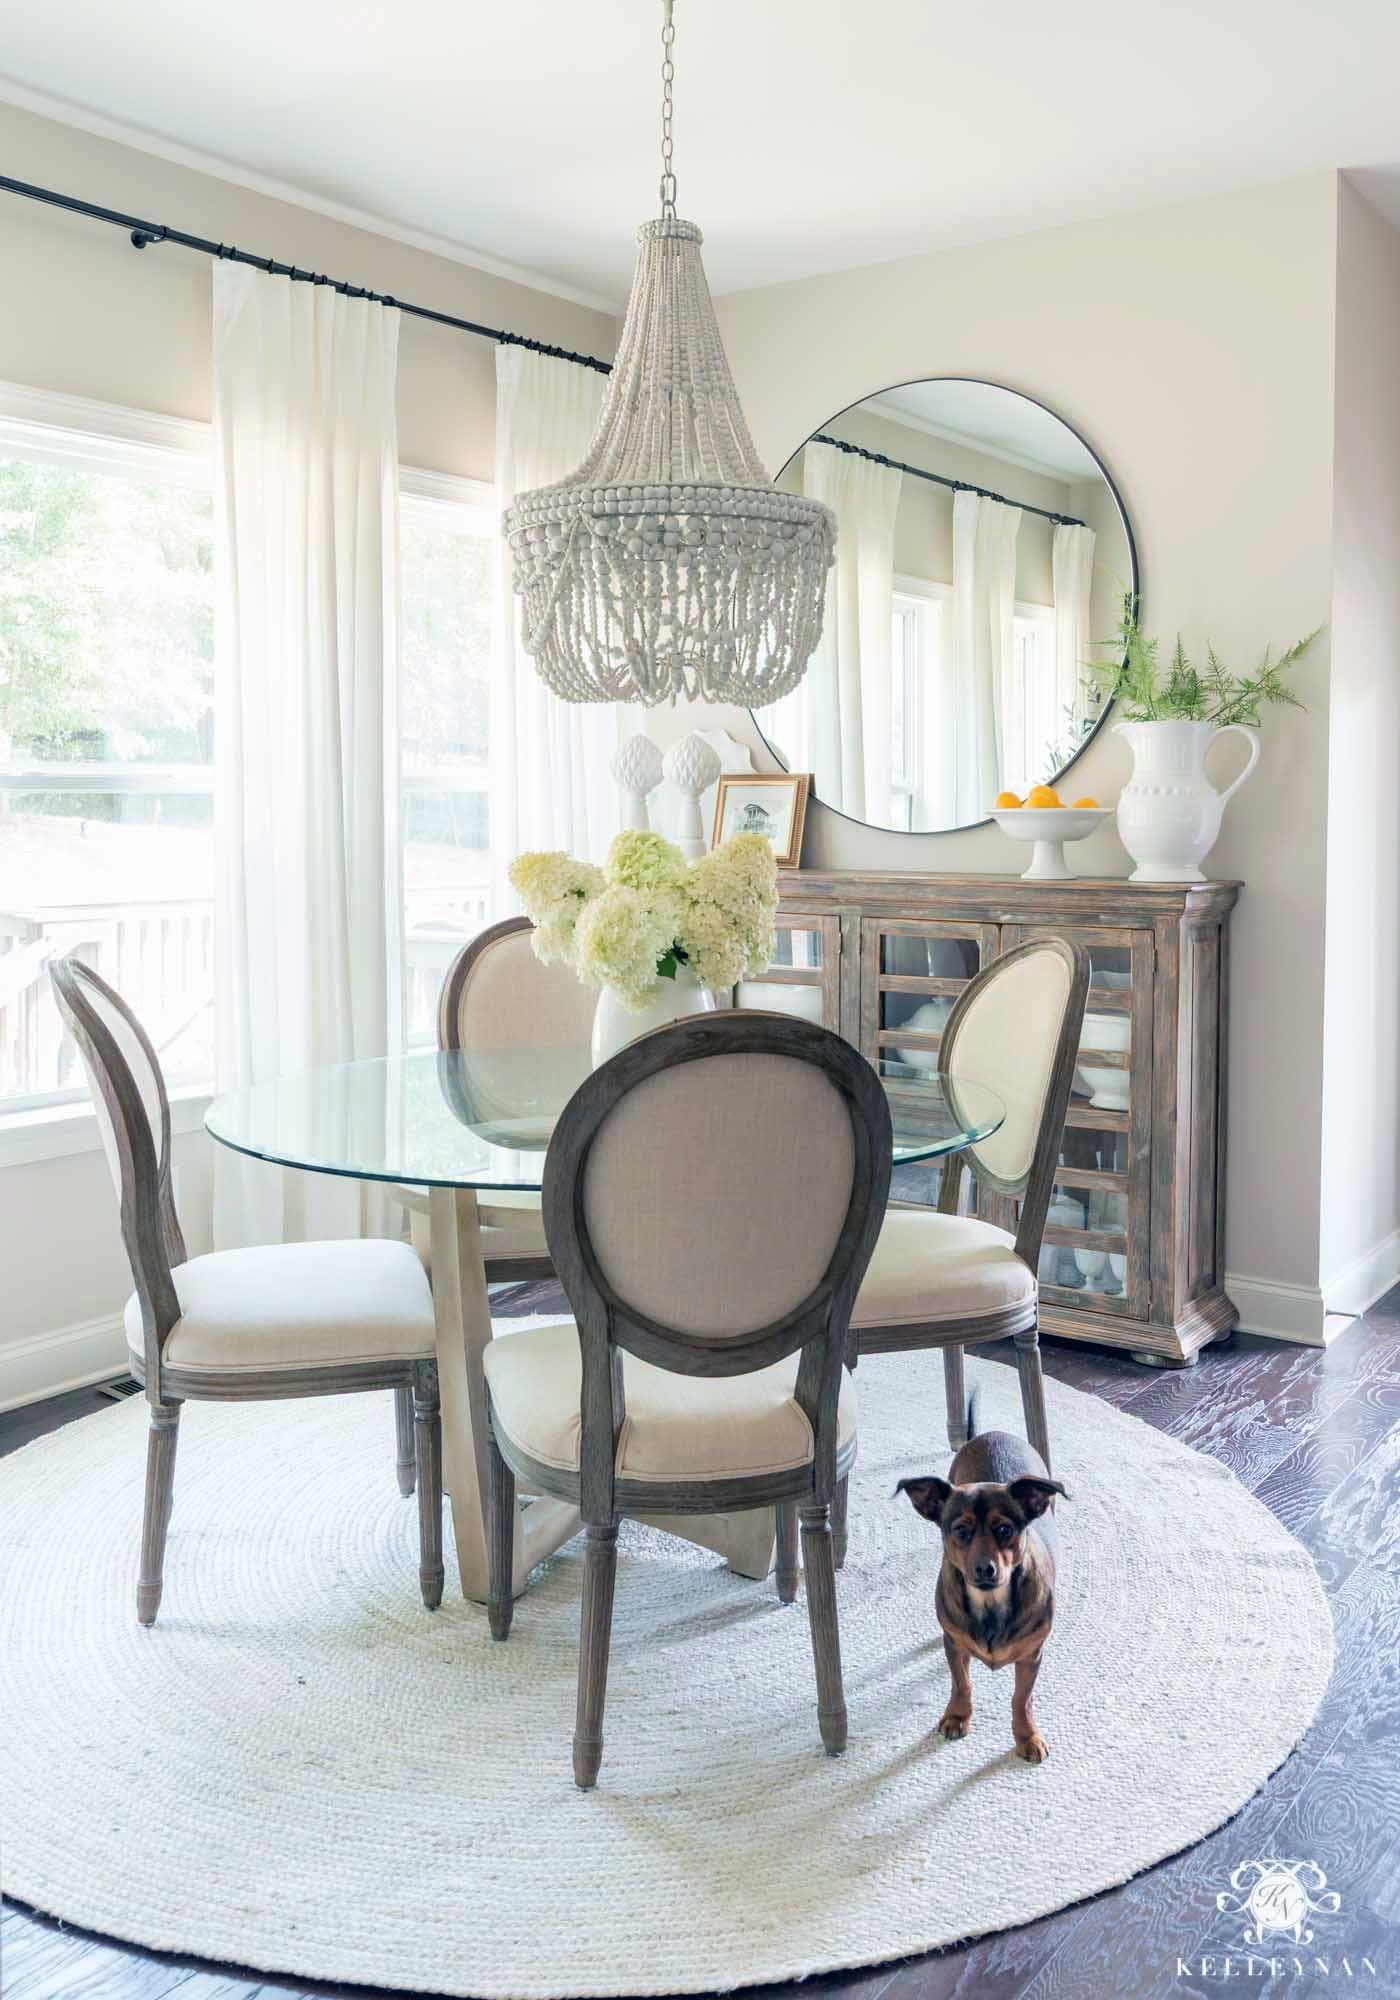 25 Splendid Pet Friendly Living Room Furniture Design Ideas Neutral Dining Room Round Dining Room Dining Room Rug #pet #friendly #living #room #furniture